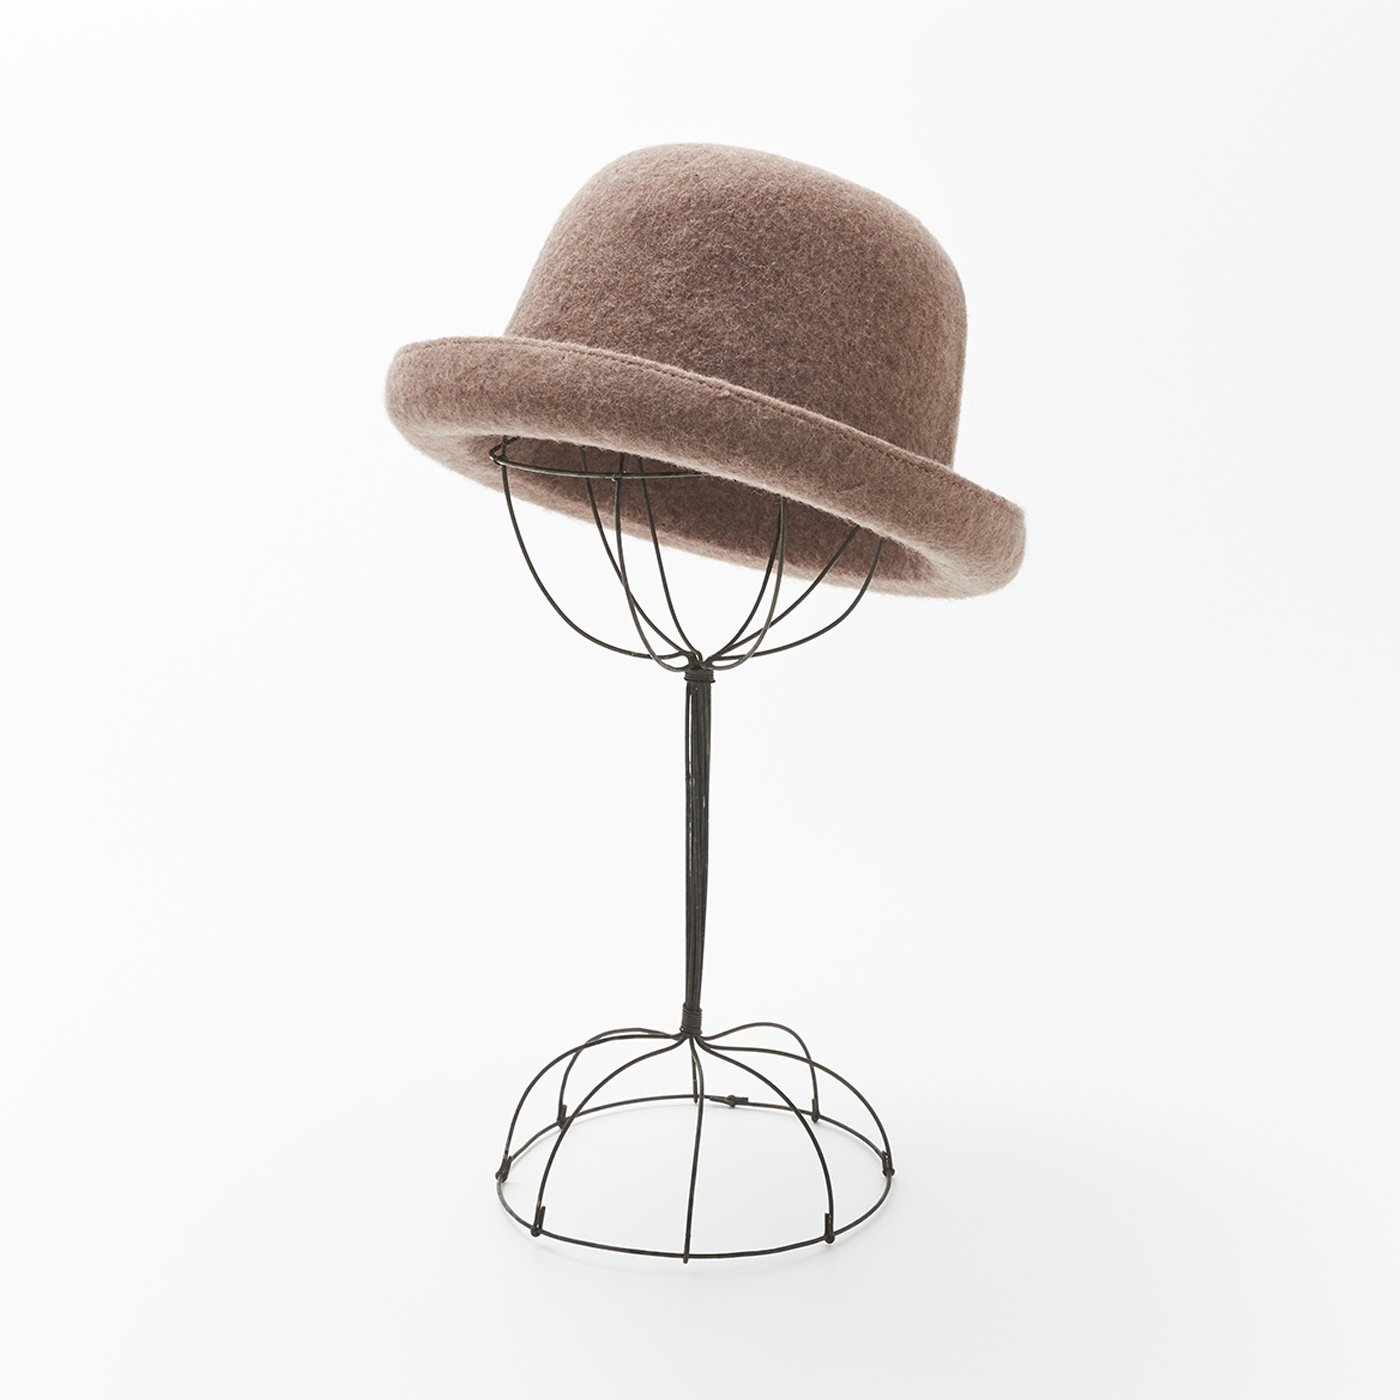 odds バスクのハット帽〈モカ〉